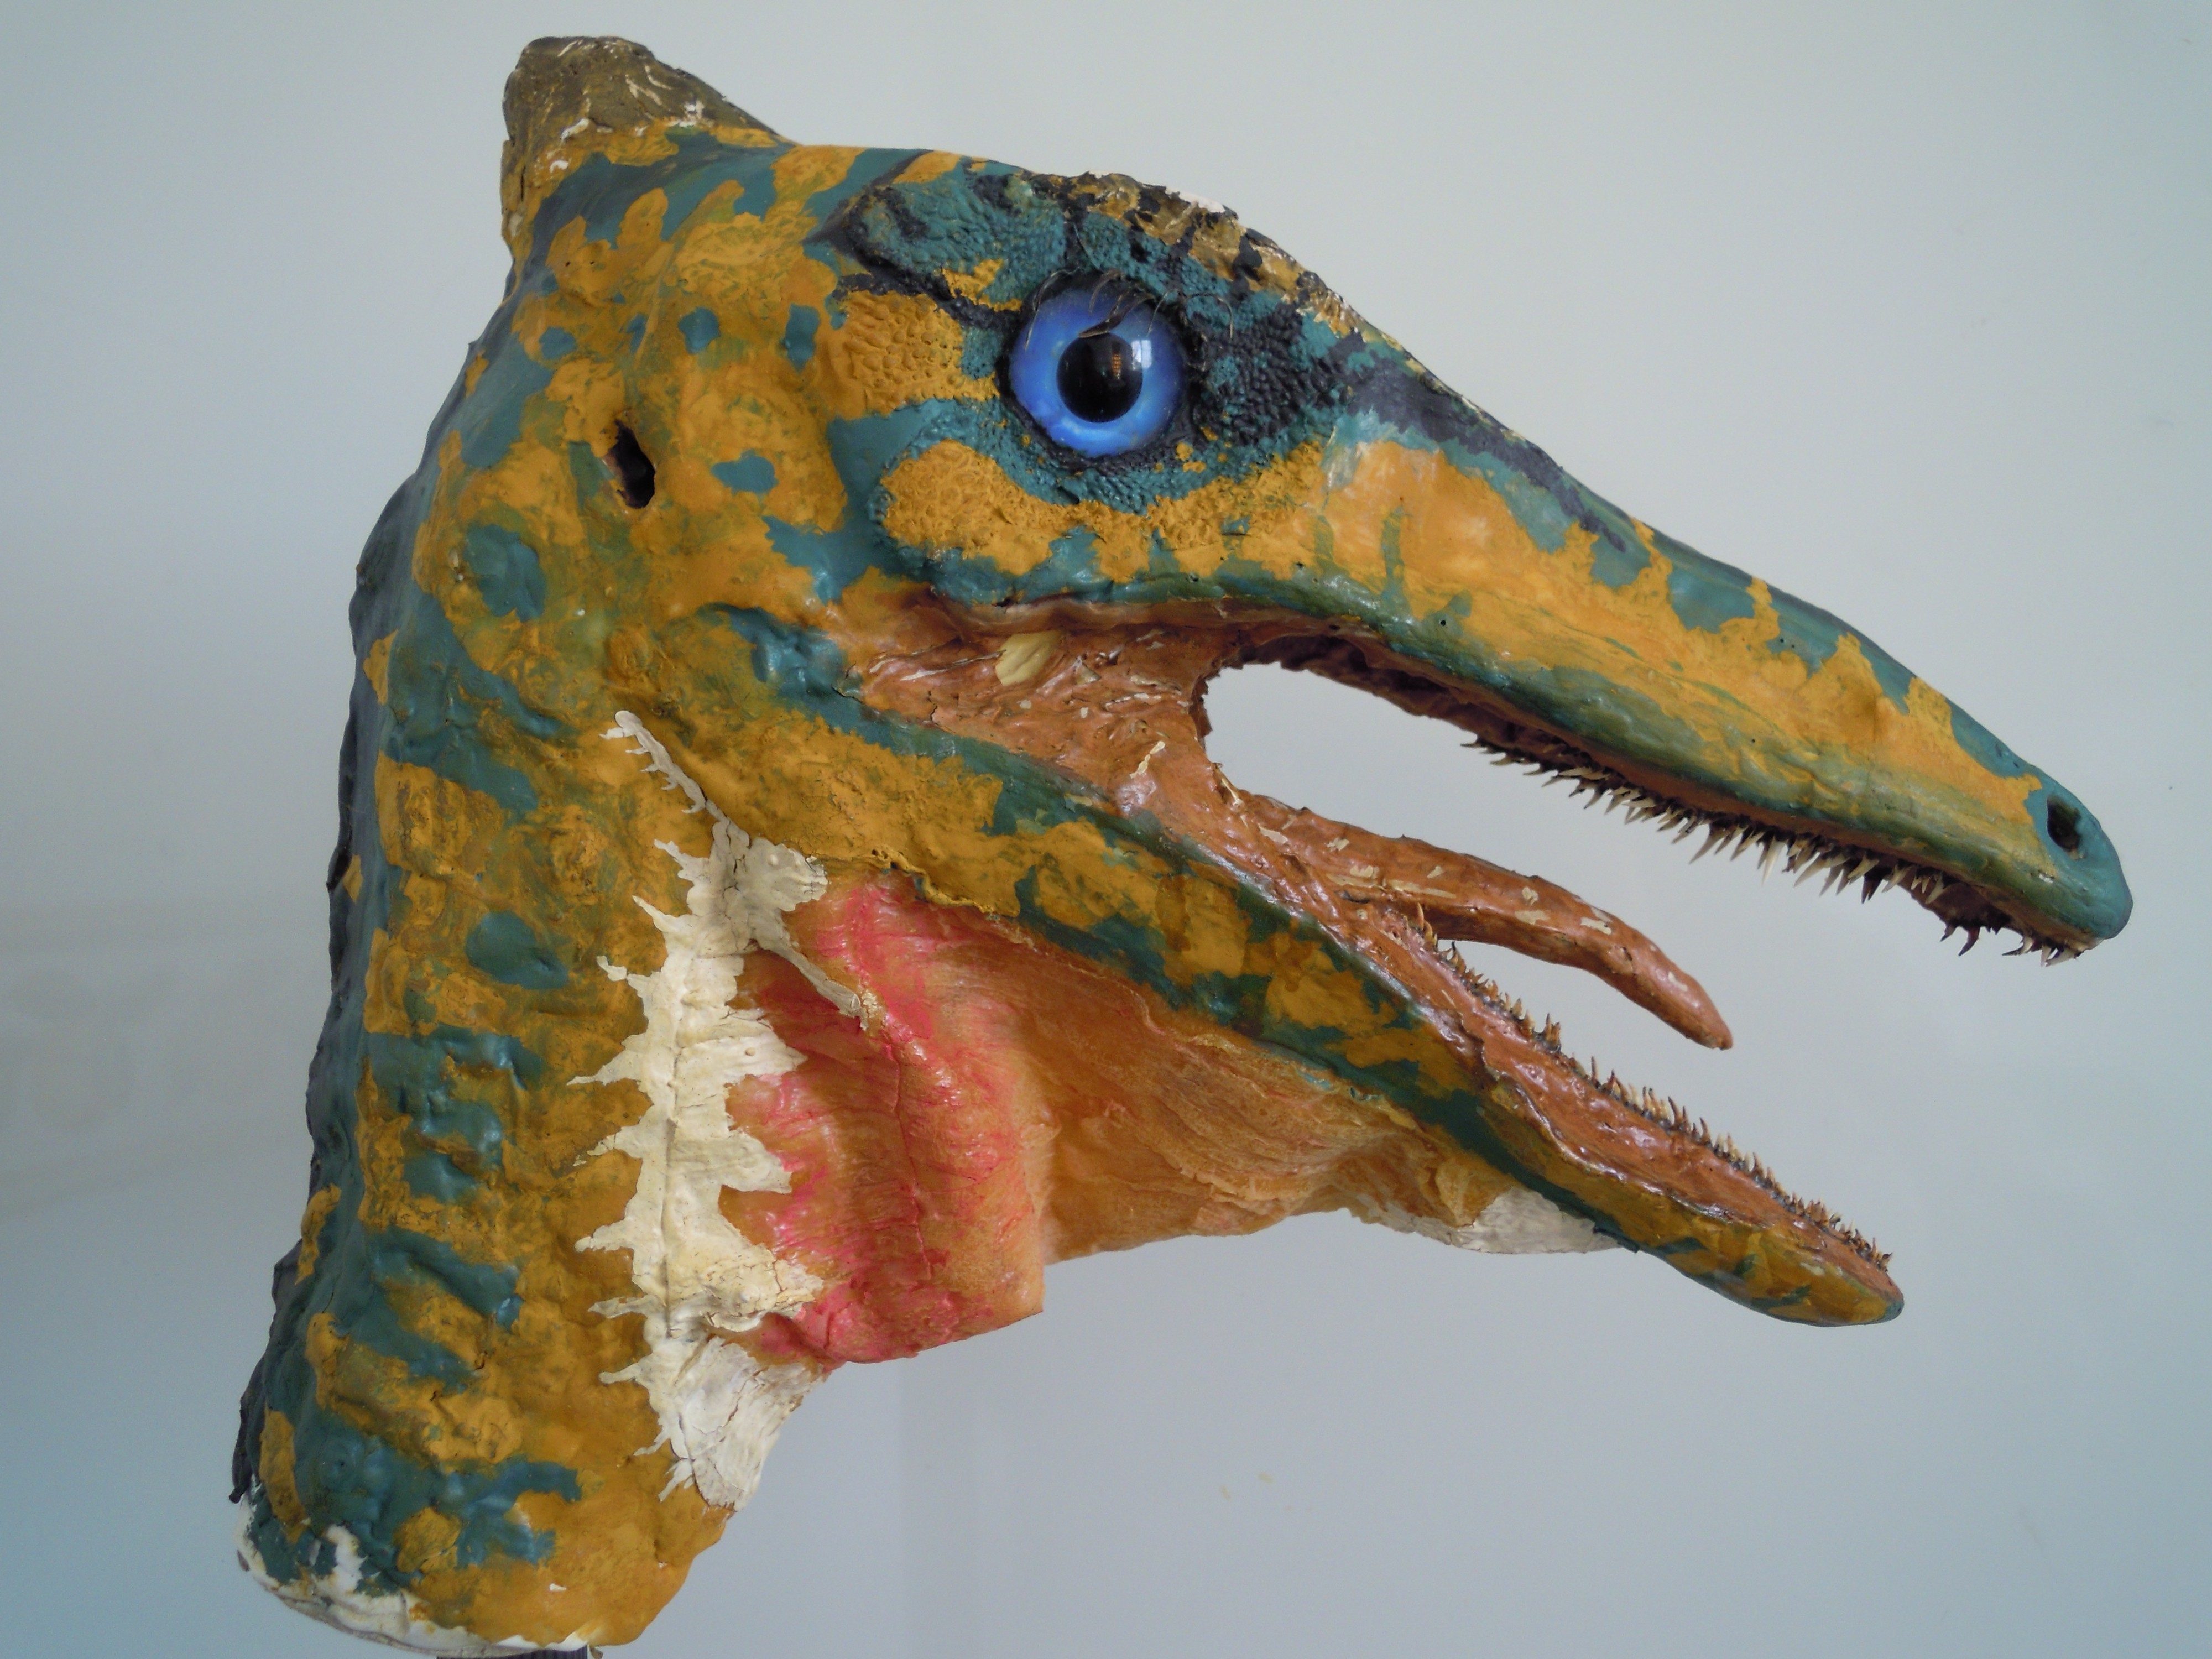 Pelecanimimus polyodon